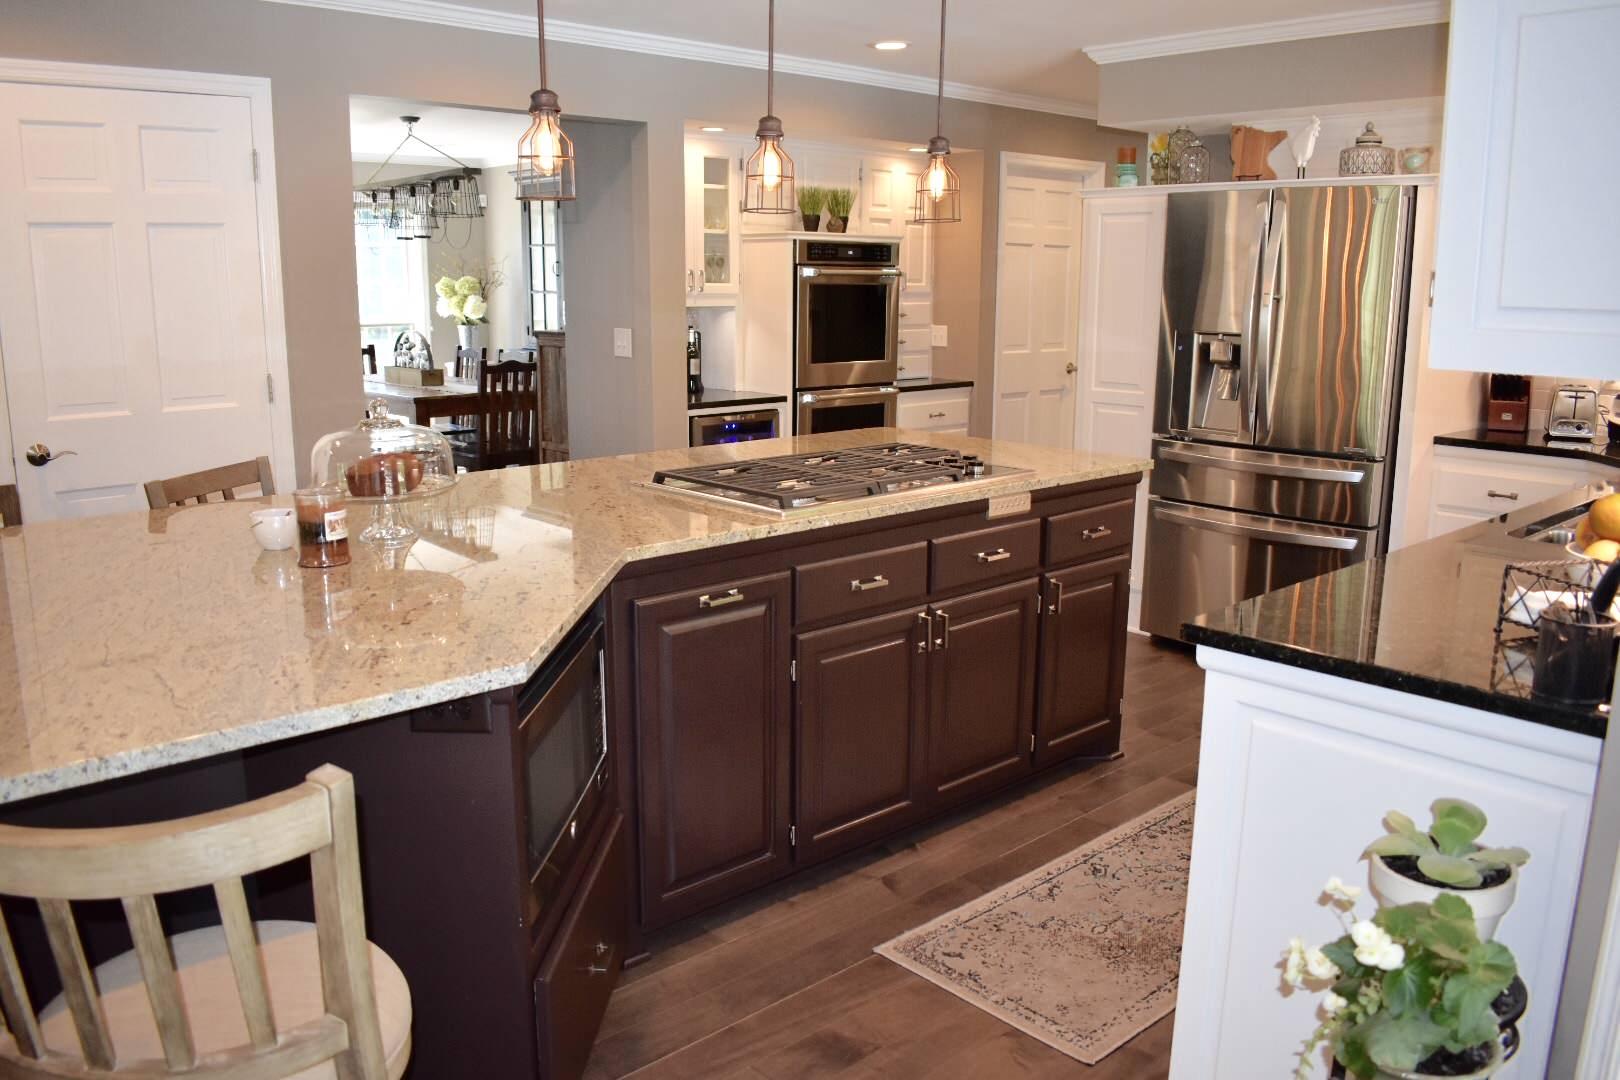 North Oaks - Mudroom Conversion and Kitchen Refresh